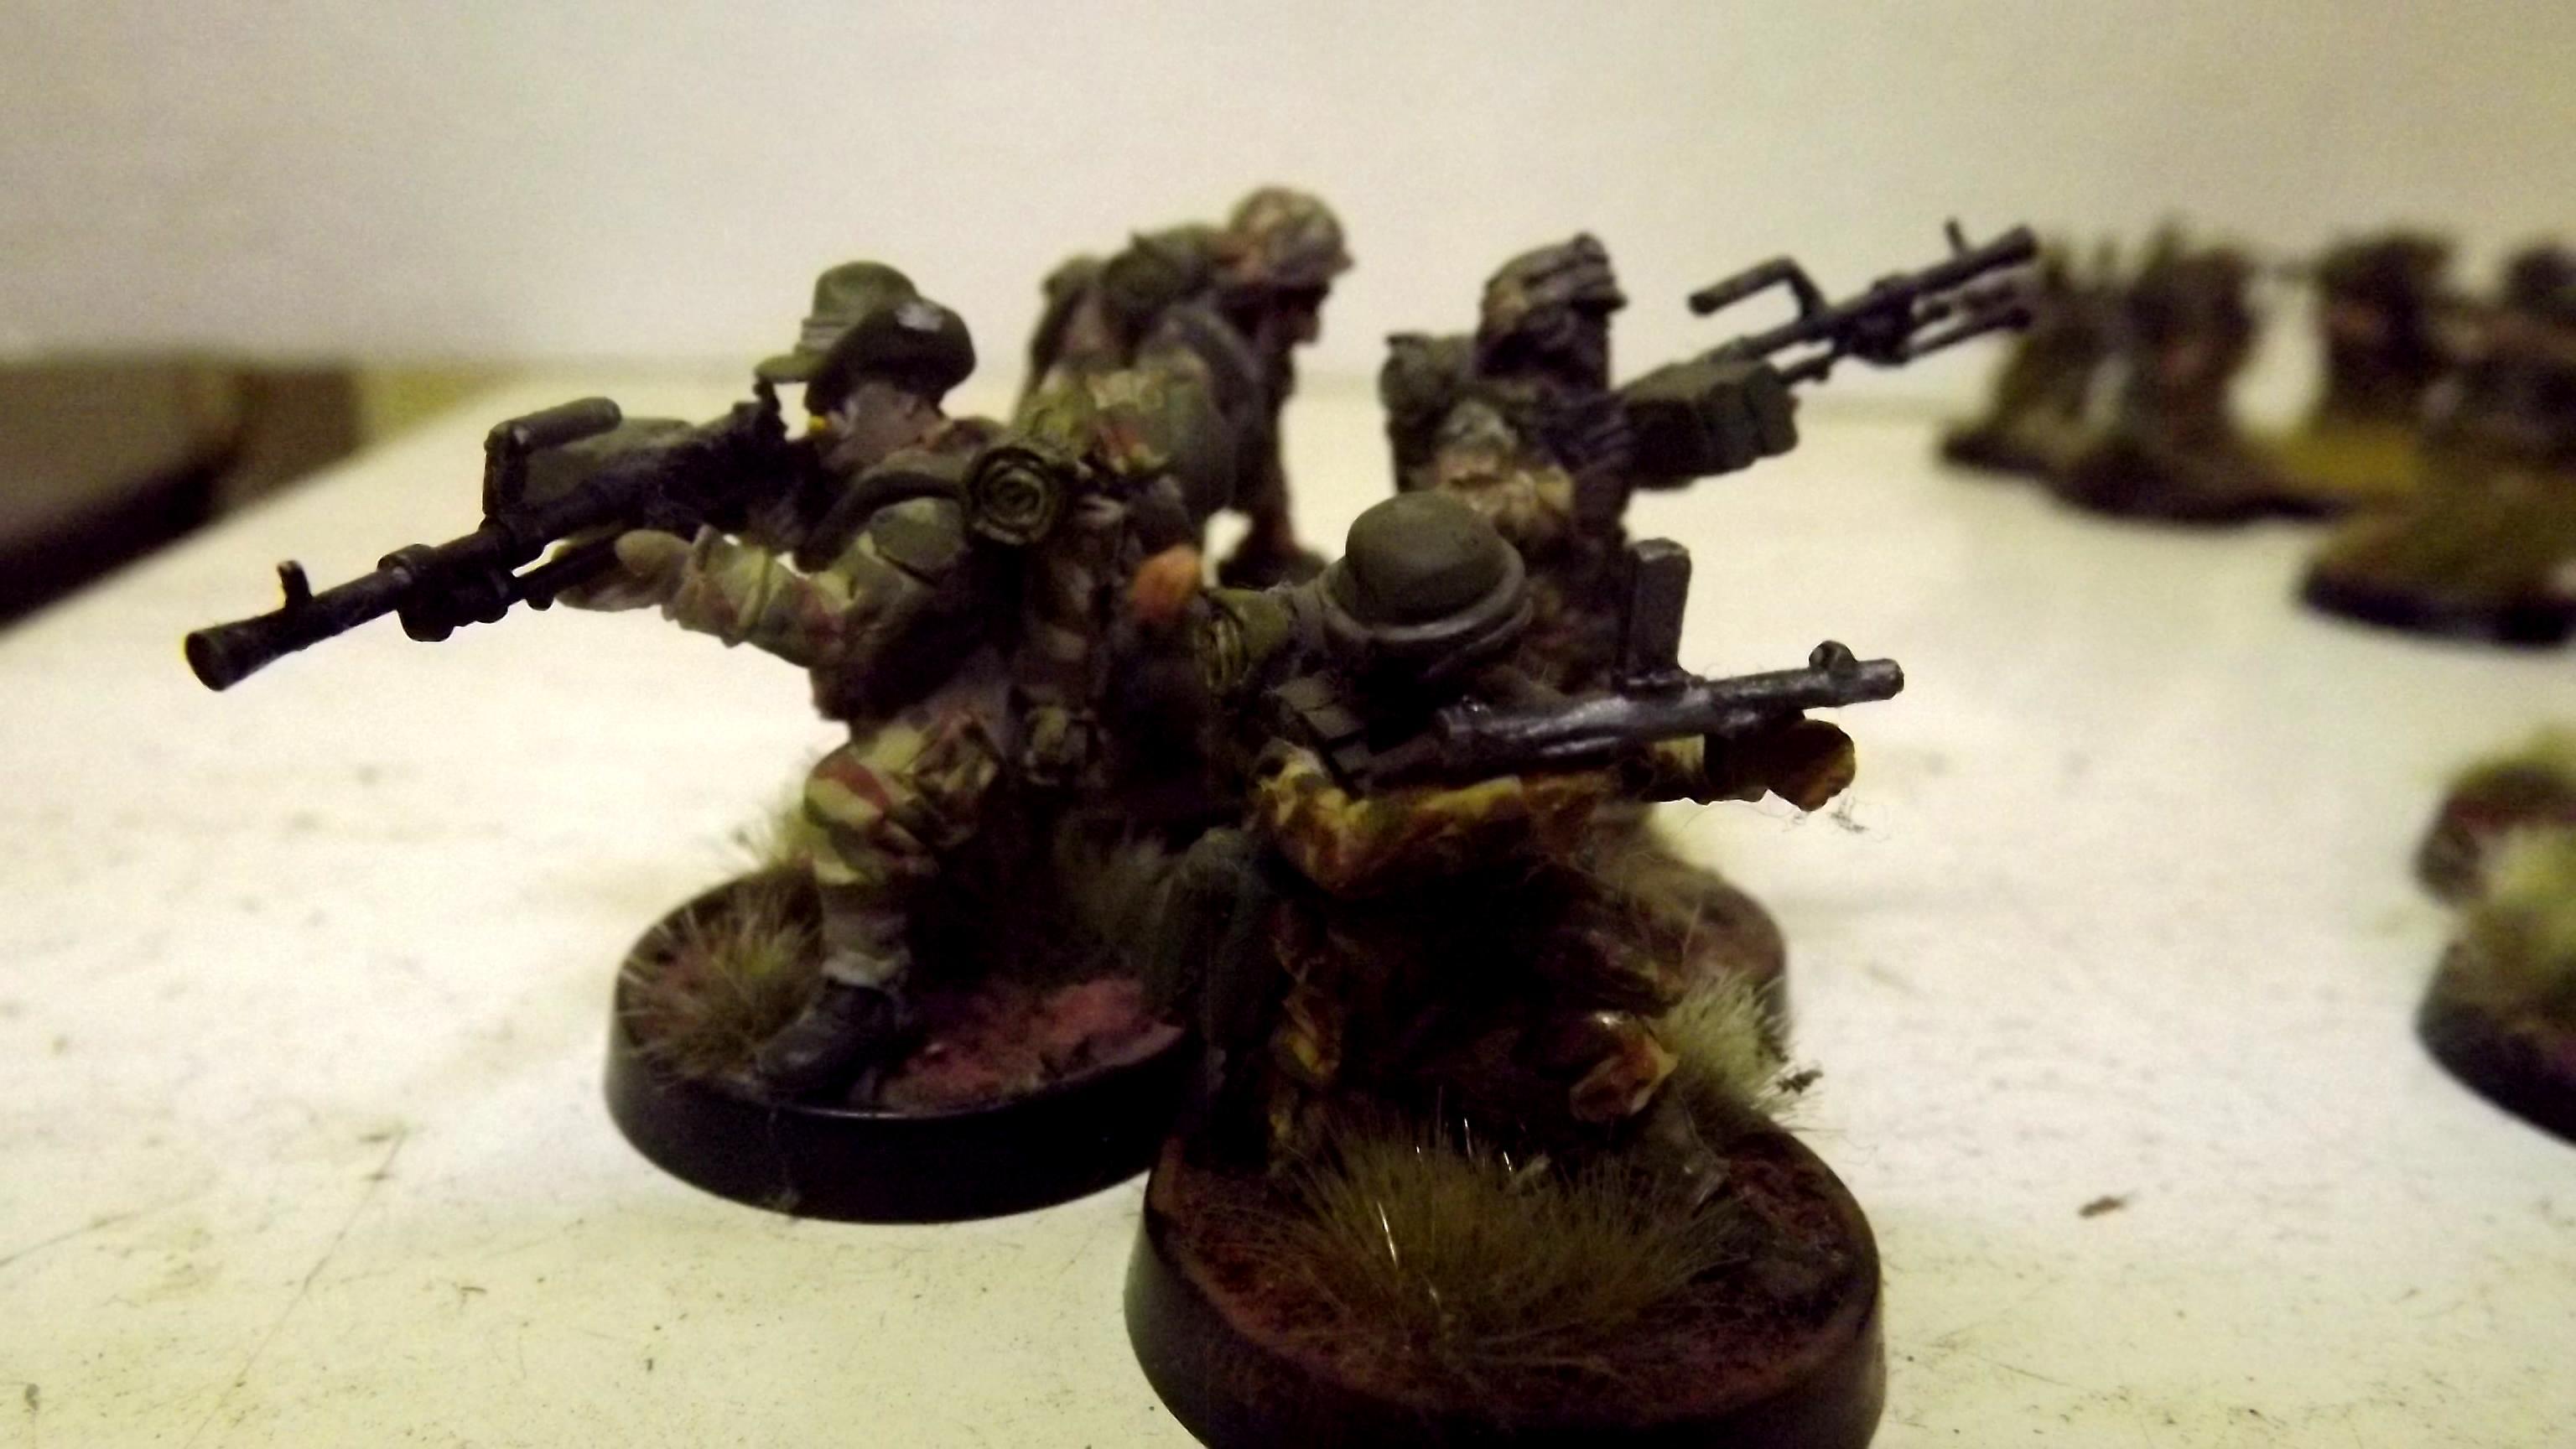 Female Guardsman, Guardsmen, Imperial Guard, Machineguns, Suppression, Victoria Miniatures